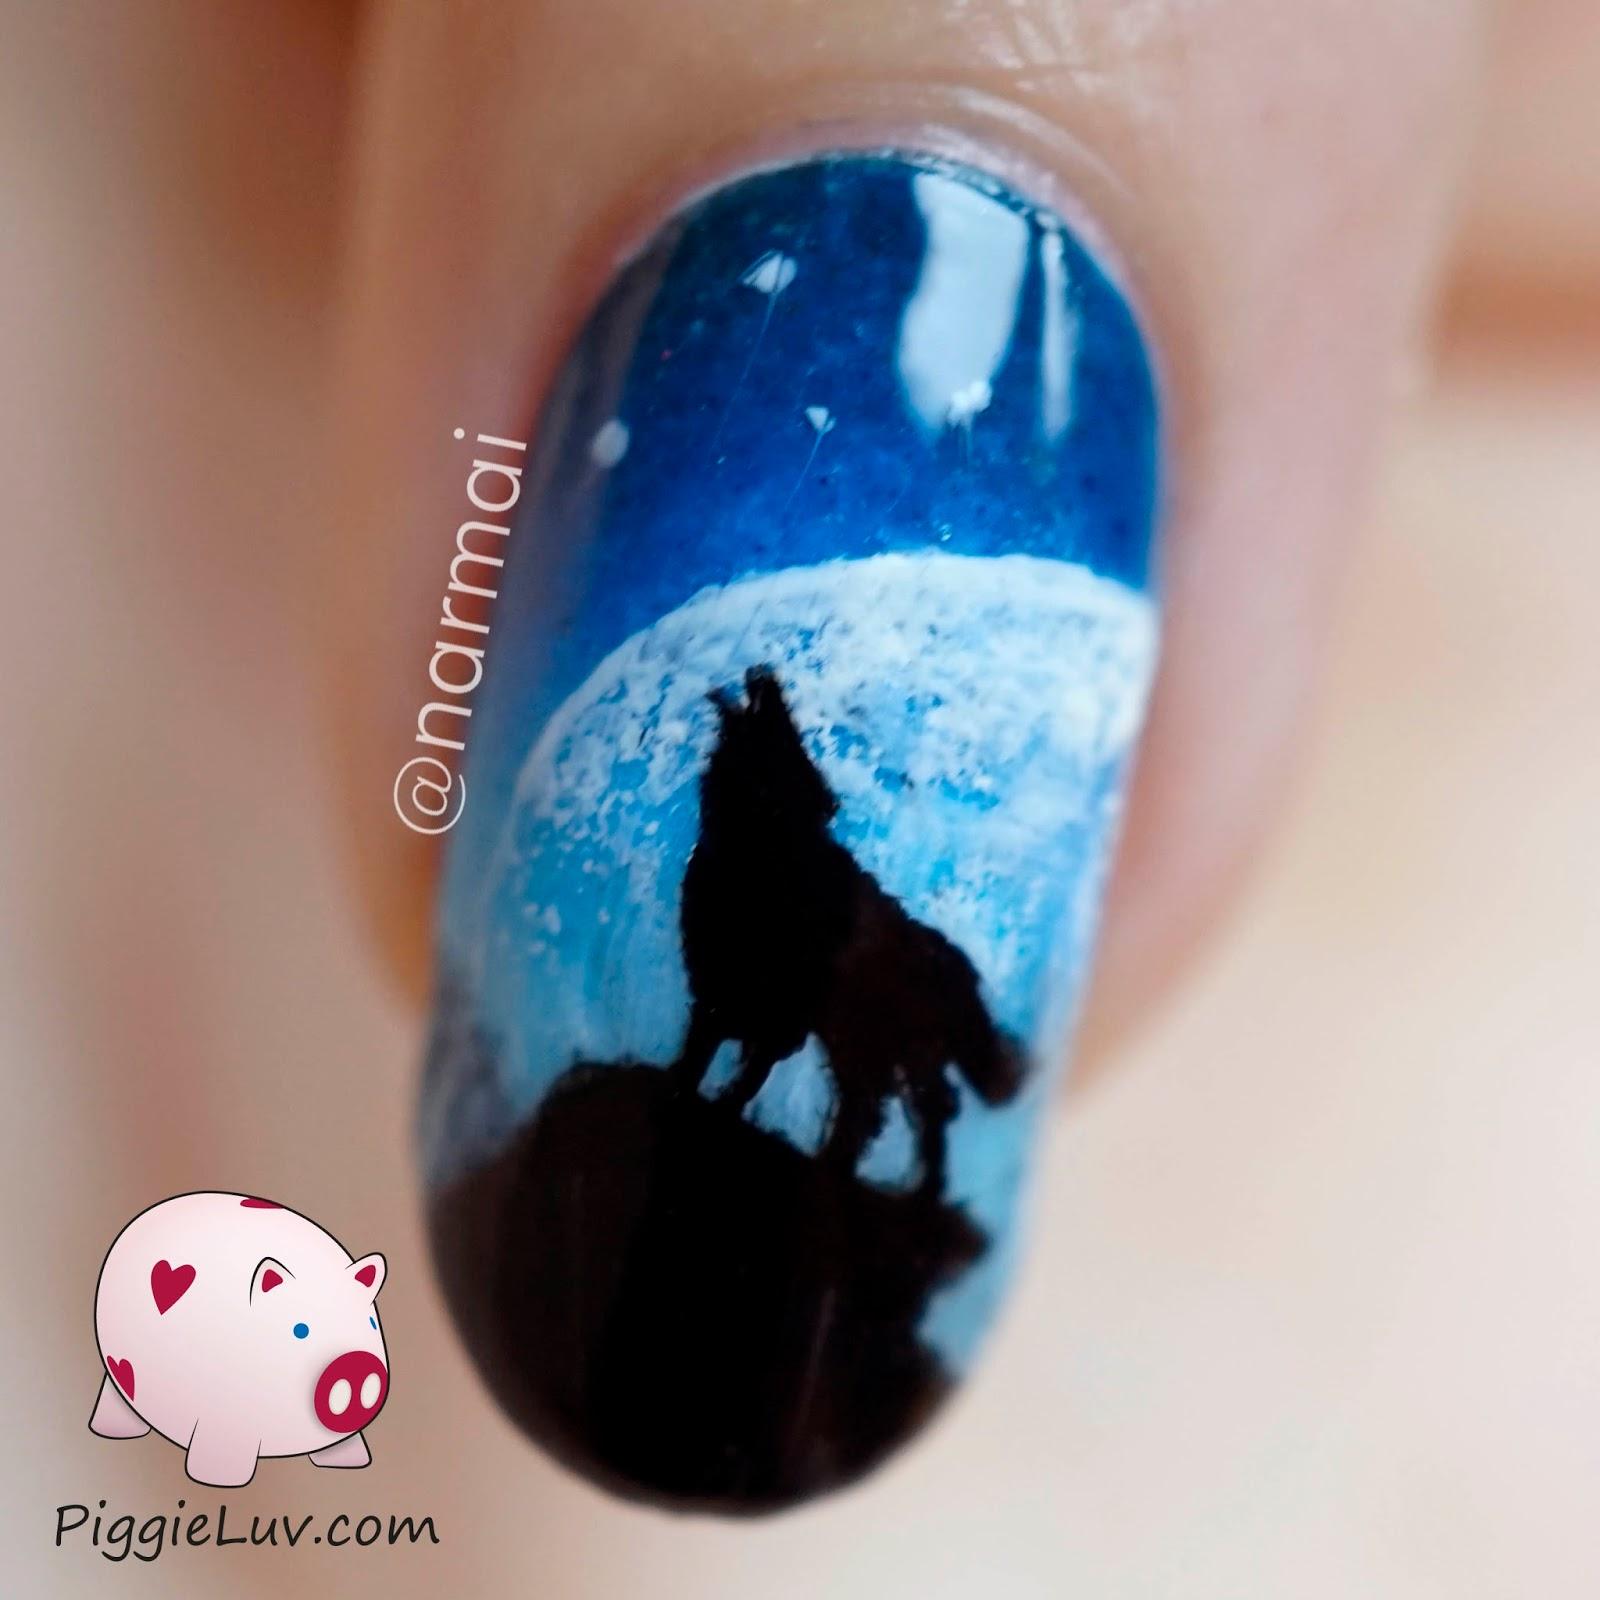 piggieluv galaxy wolf twin nails glow in the dark